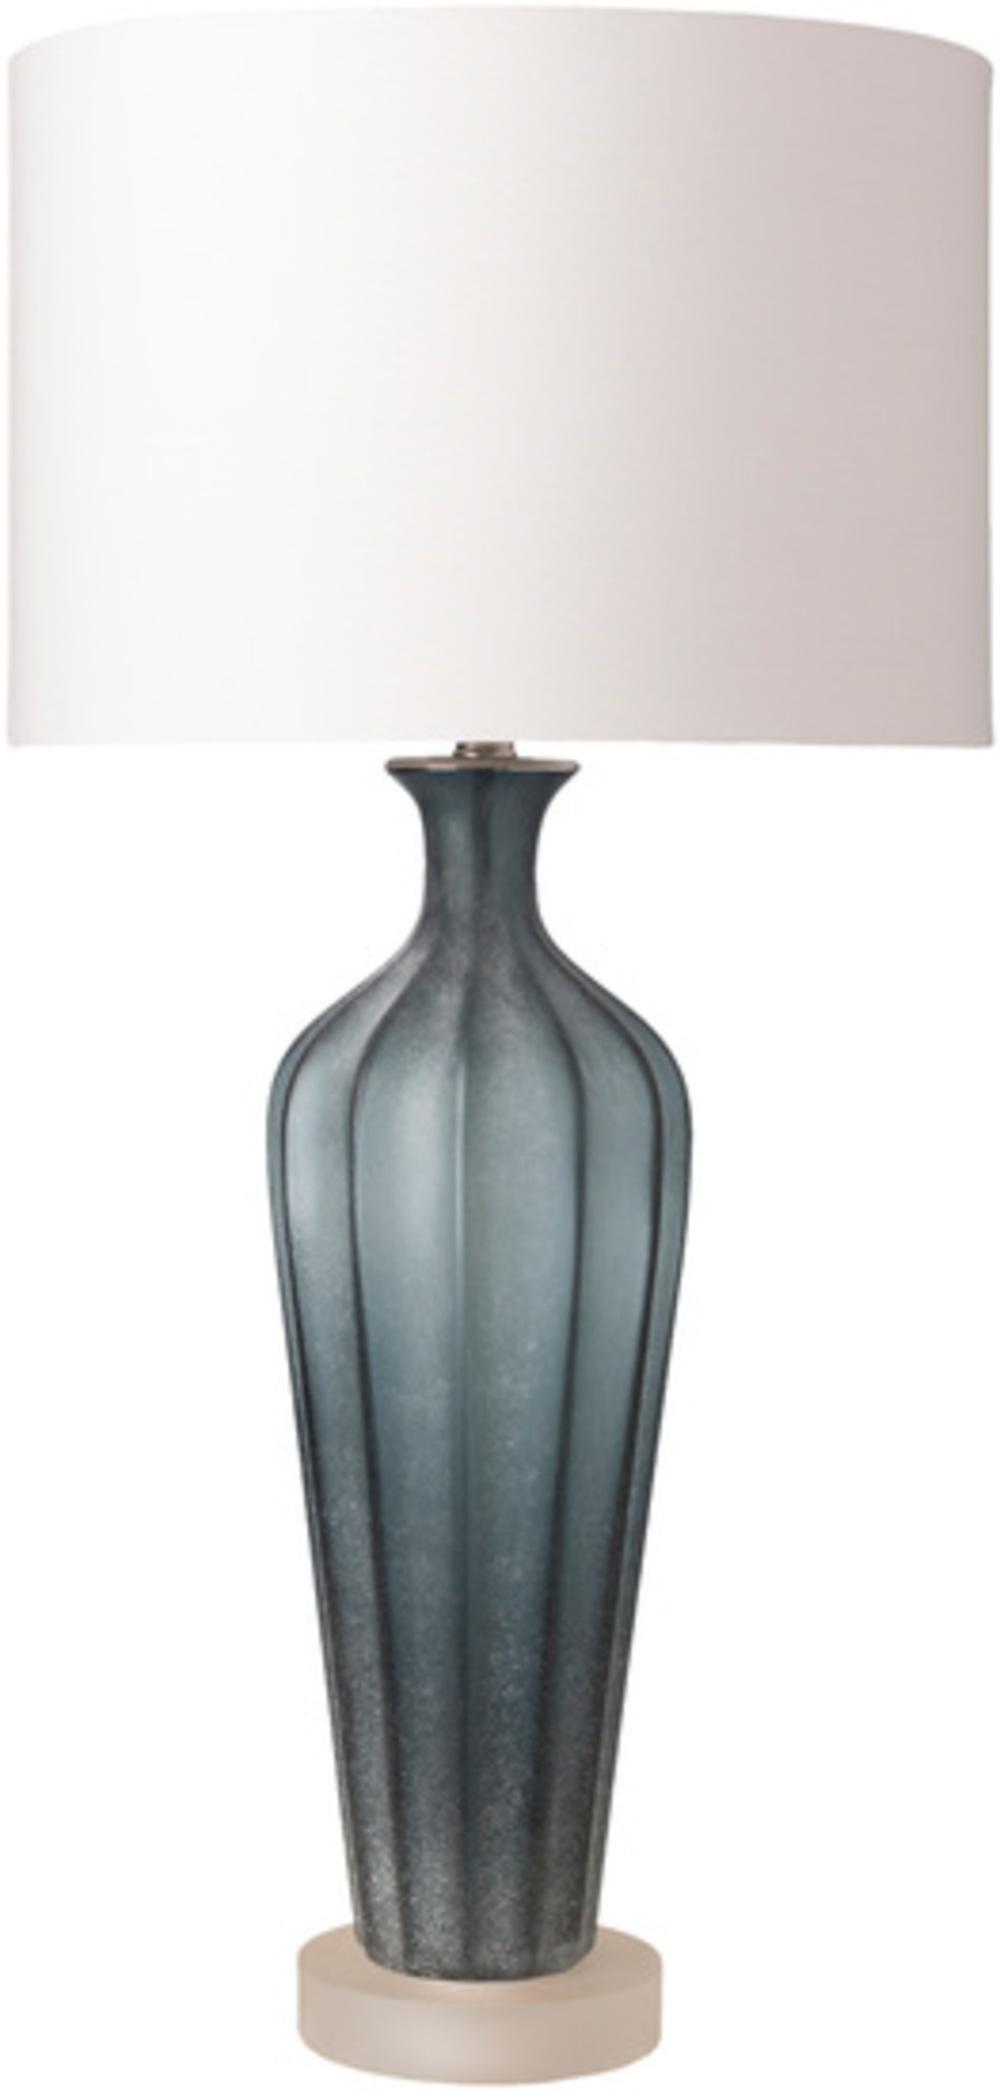 Surya - Sloane Table Lamp